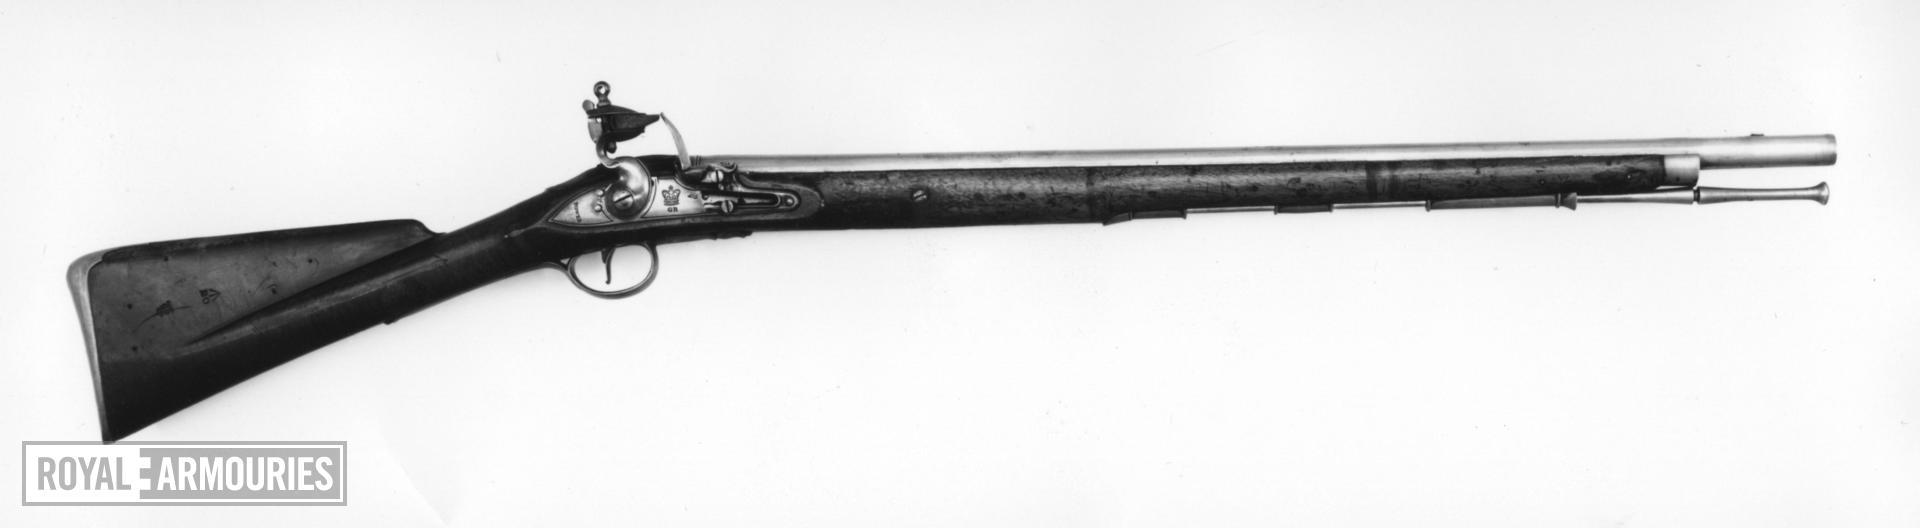 Flintlock military carbine - Pattern 1773 Eliott type 2